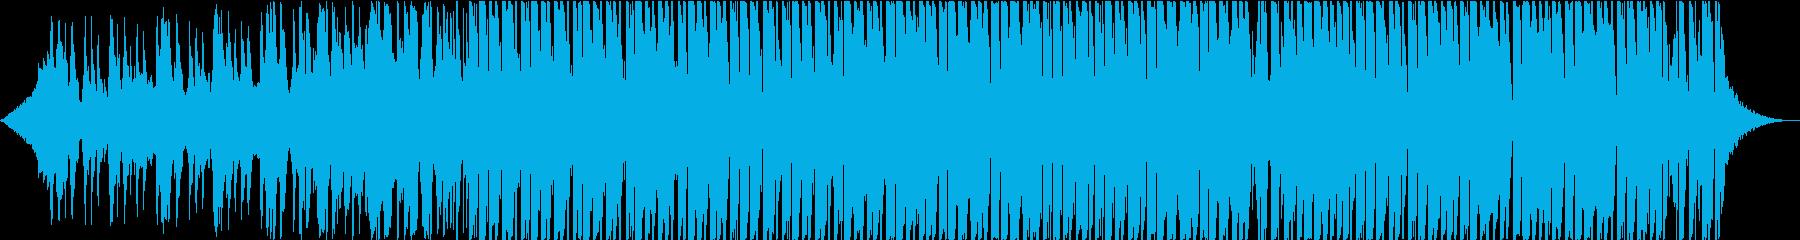 Deep House Musicの再生済みの波形